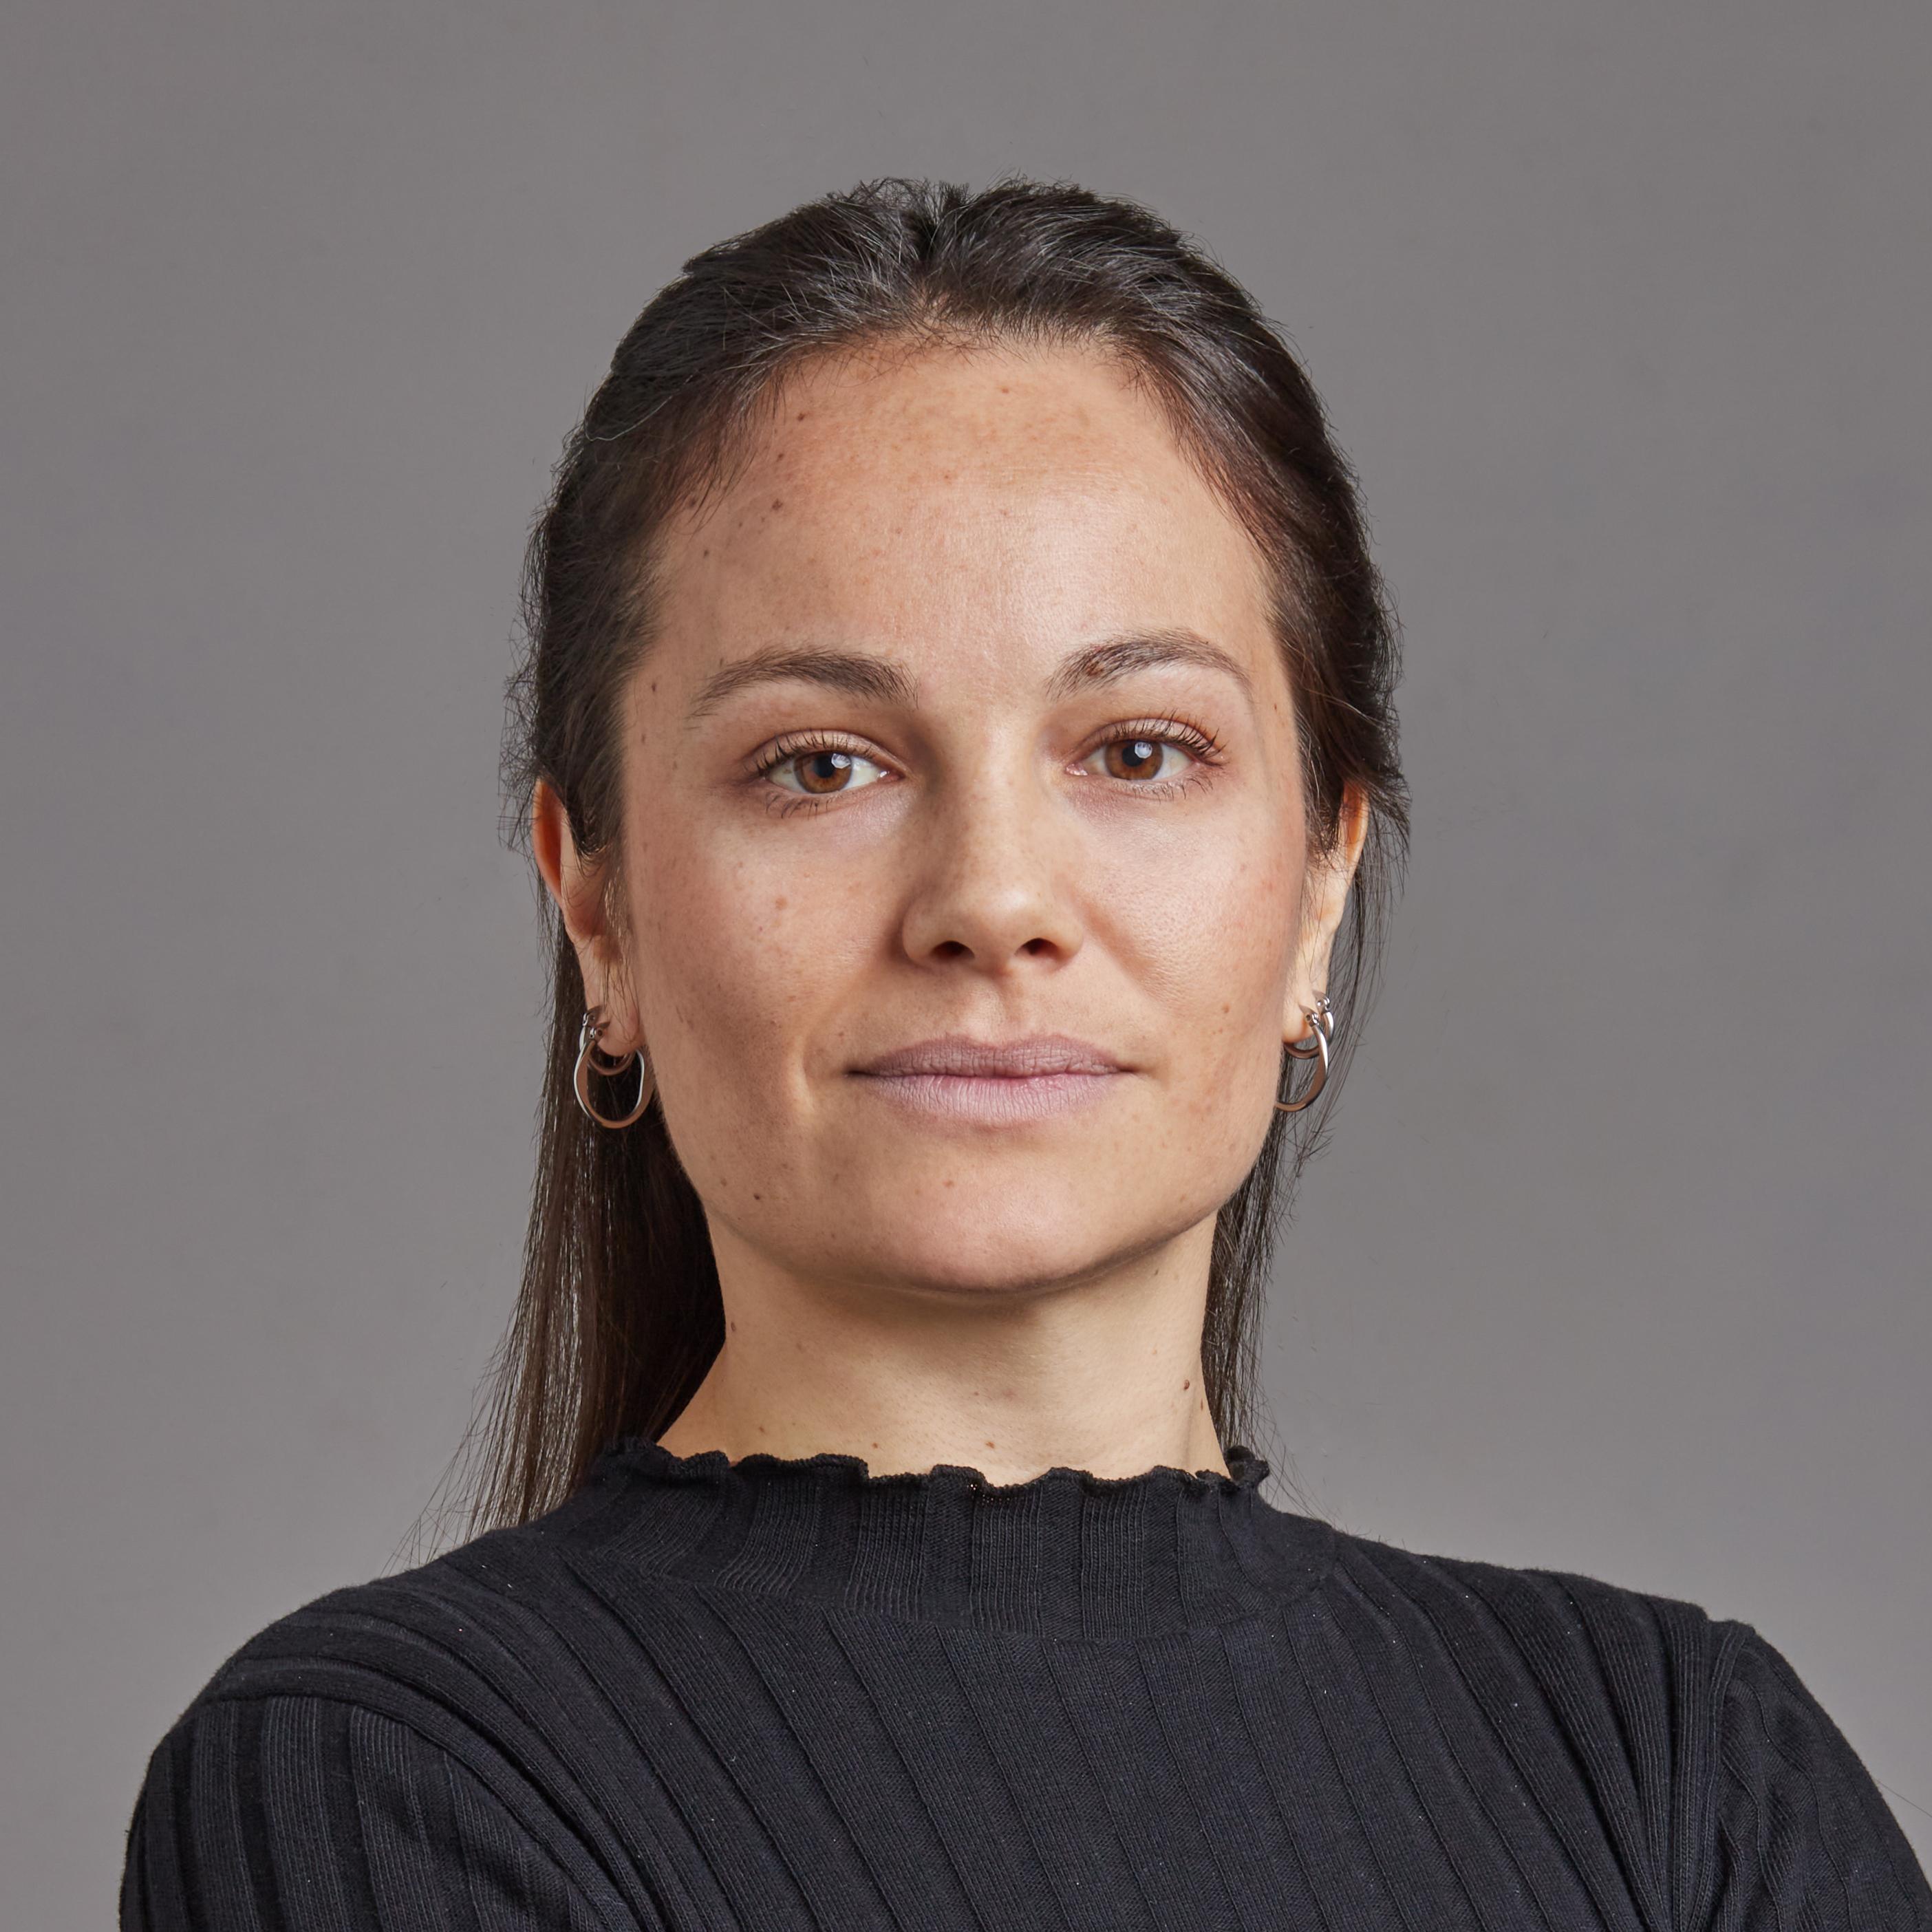 Ileana Borbonet